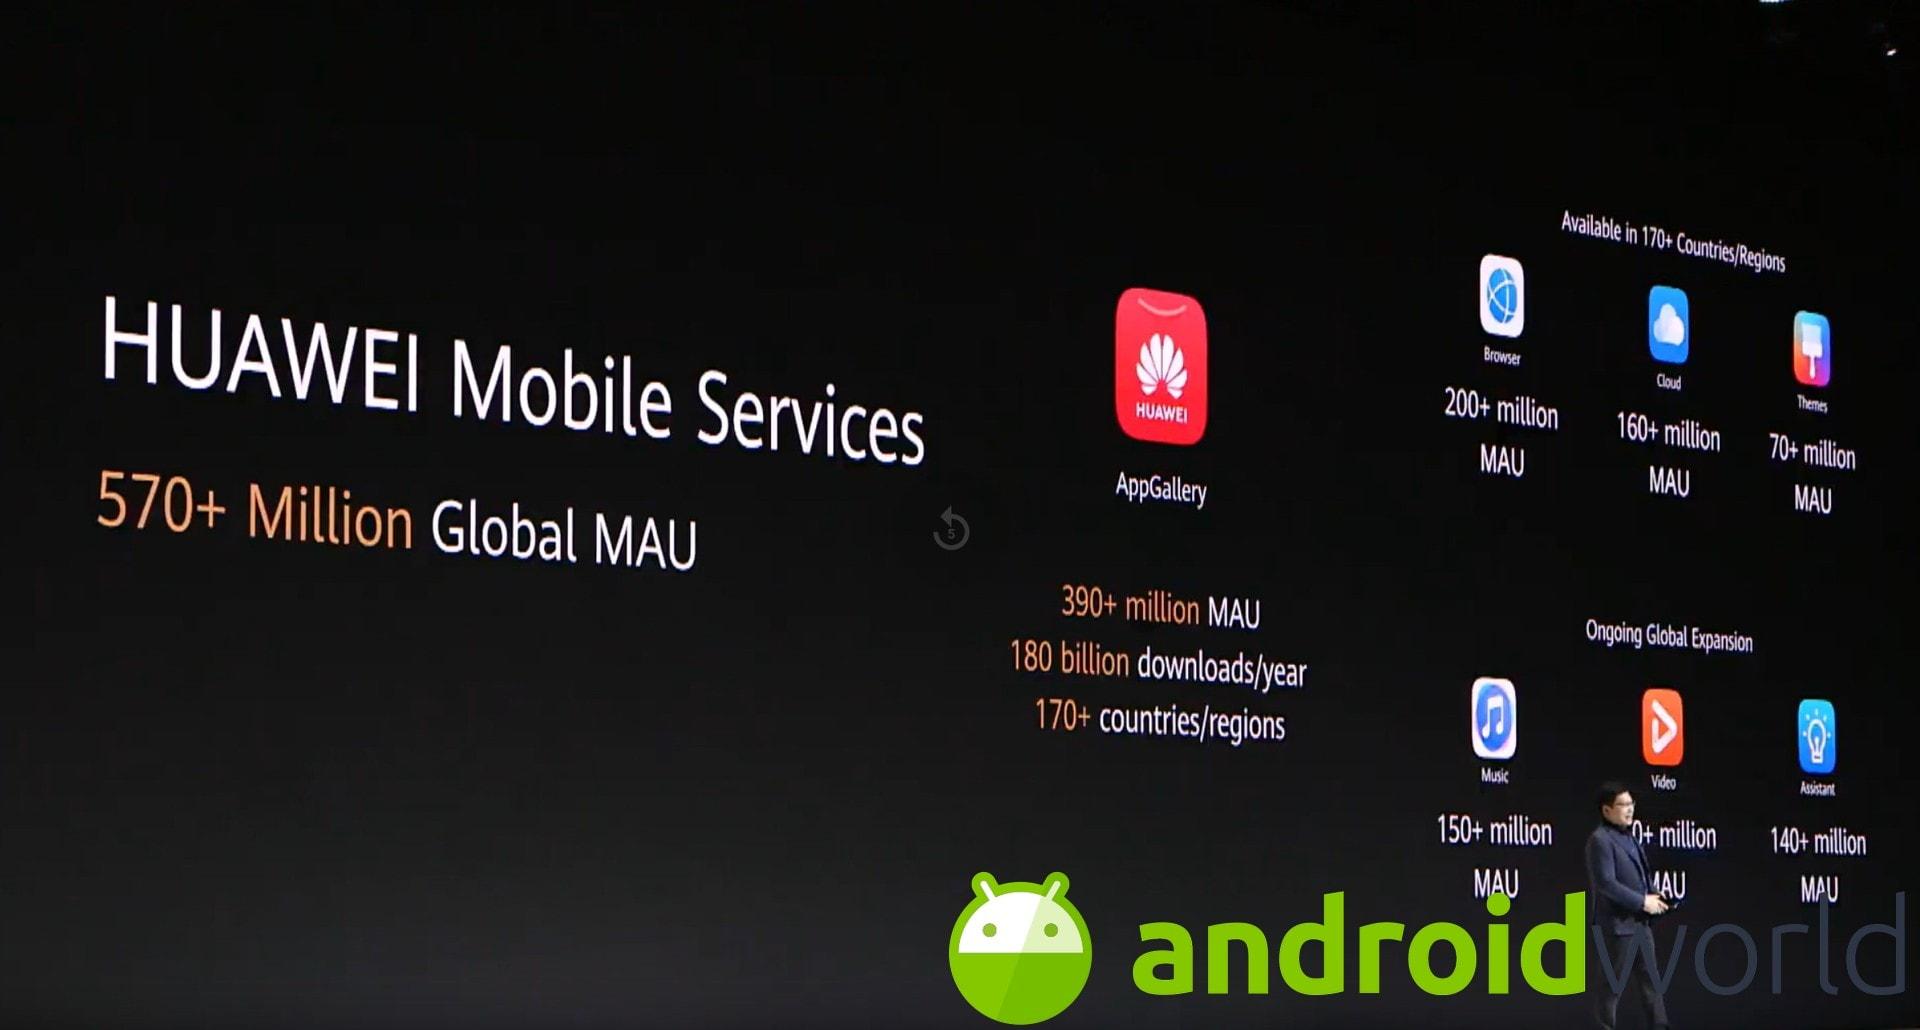 La riscossa di Huawei? Meizu potrebbe affidarsi ai Huawei Mobile Services (foto)